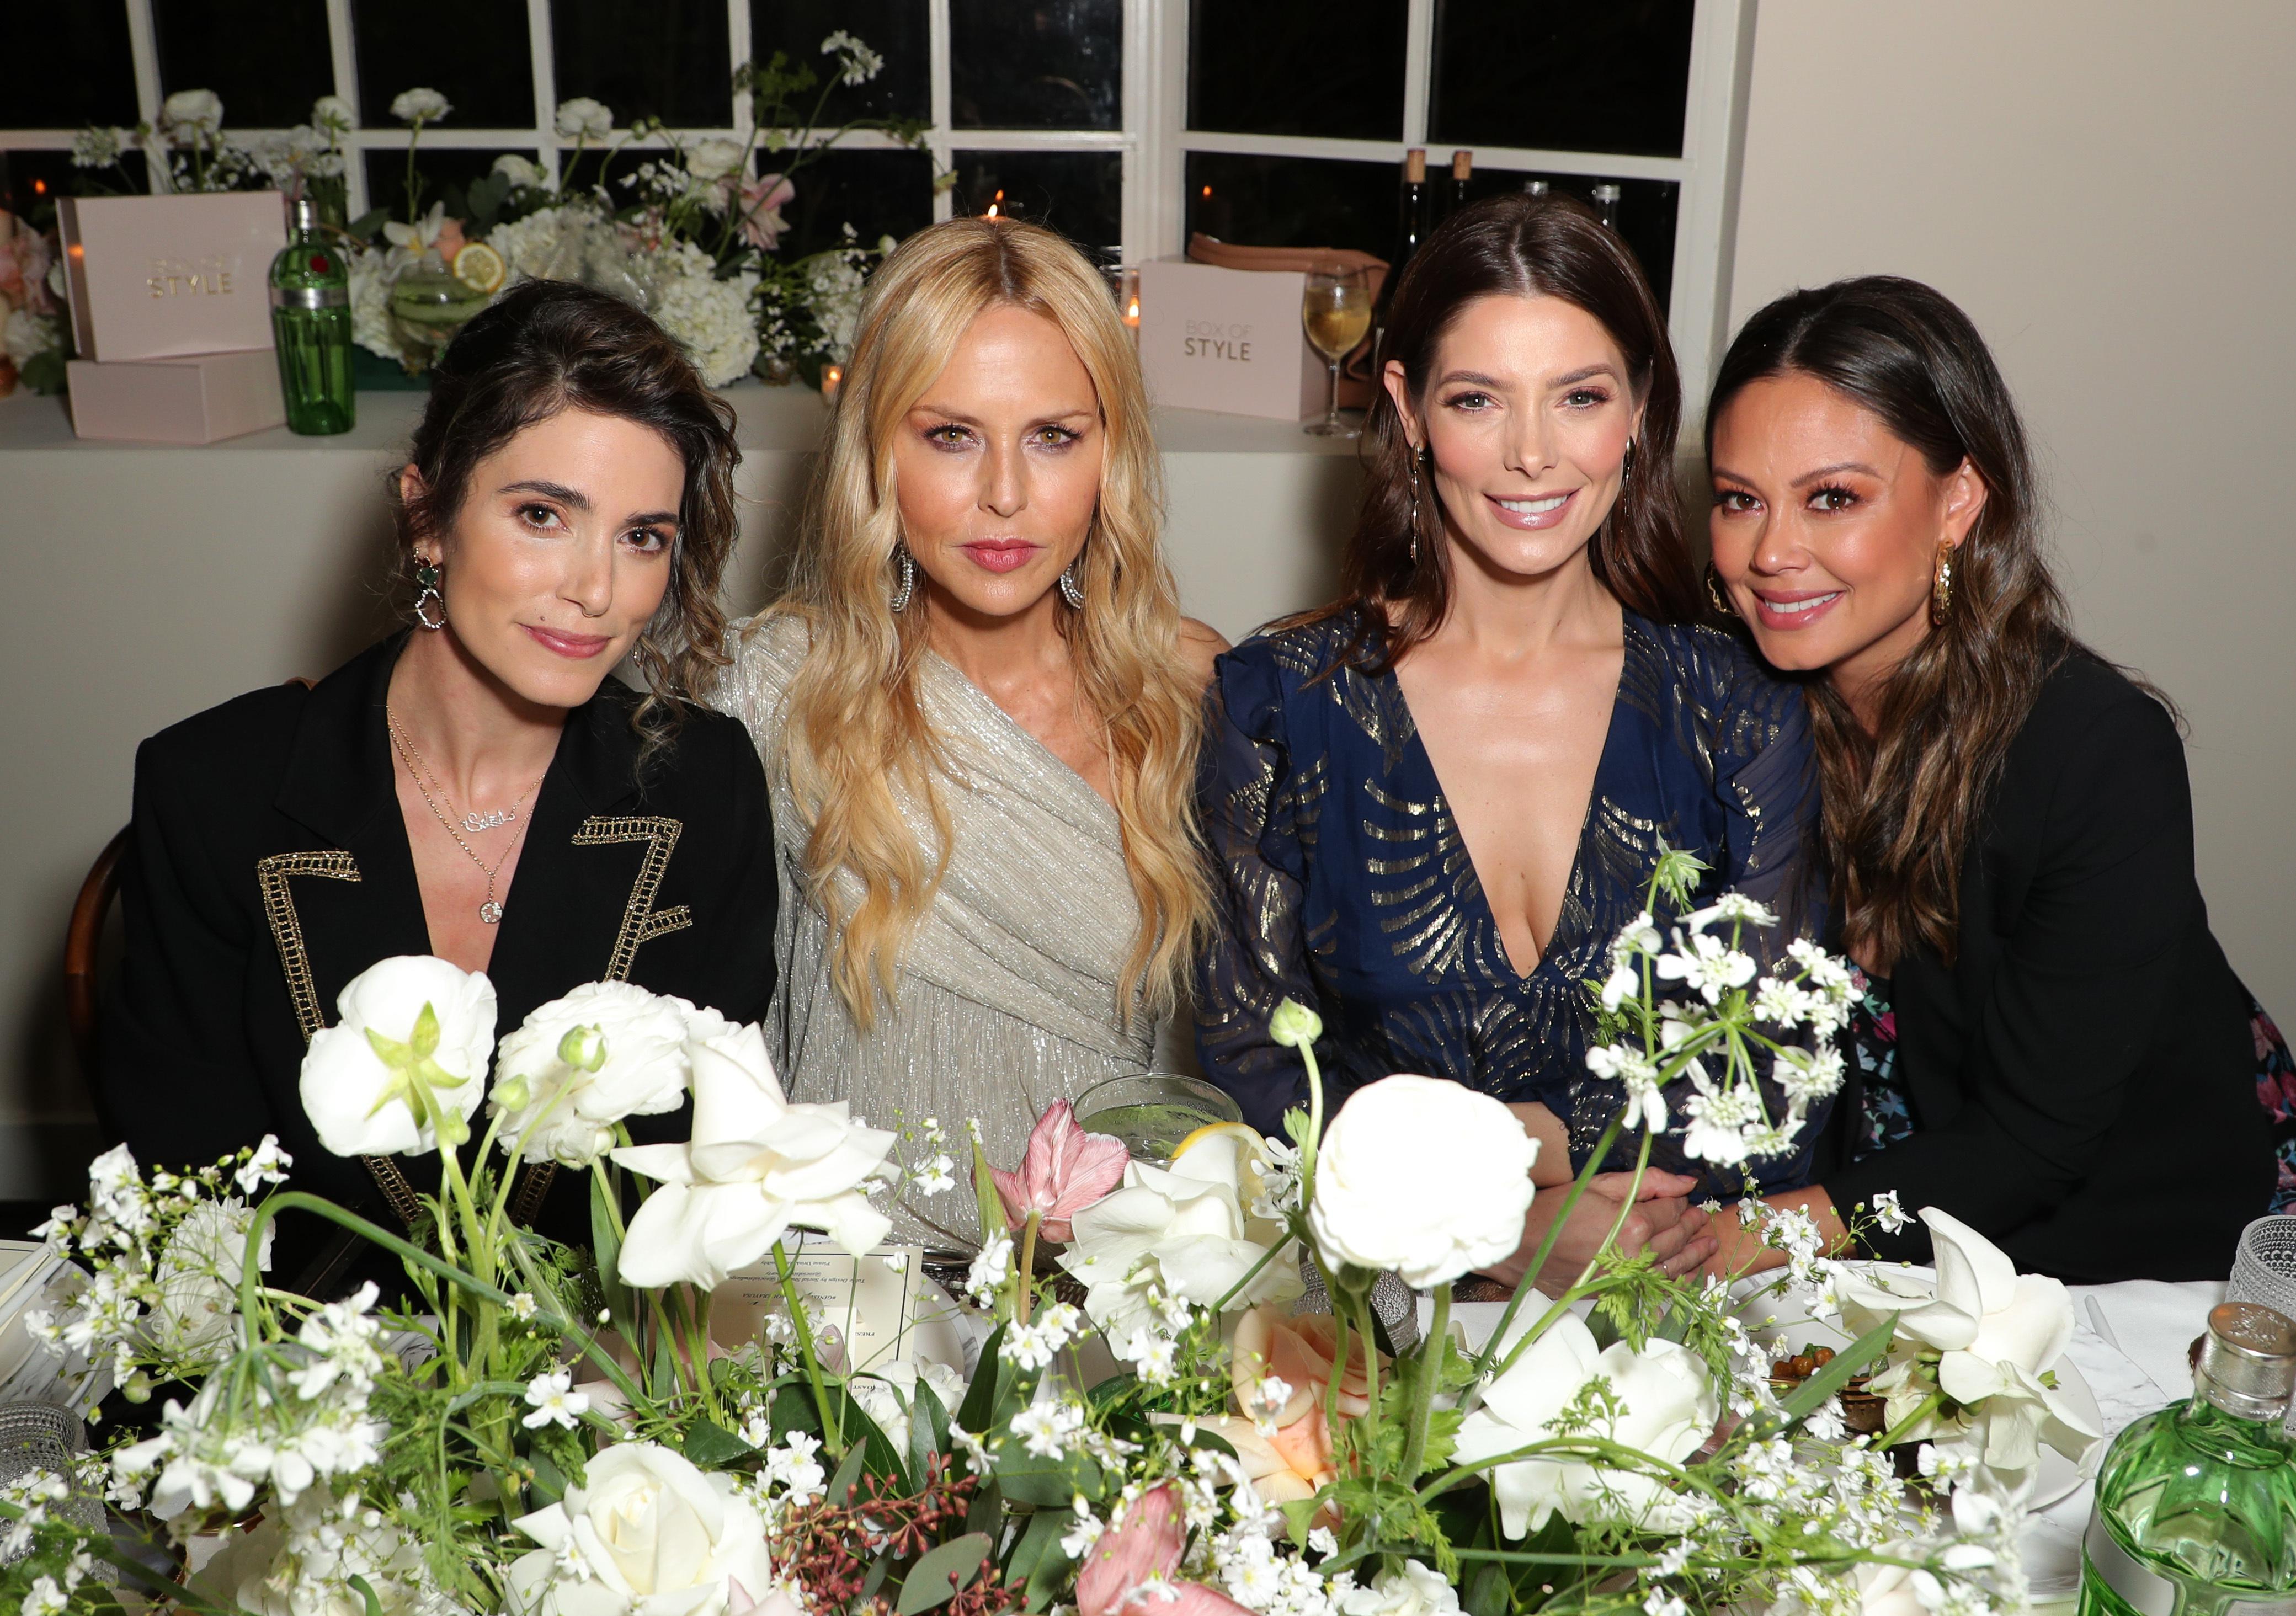 Nikki Reed, Rachel Zoe, Ashley Greene, Vanessa Lachey